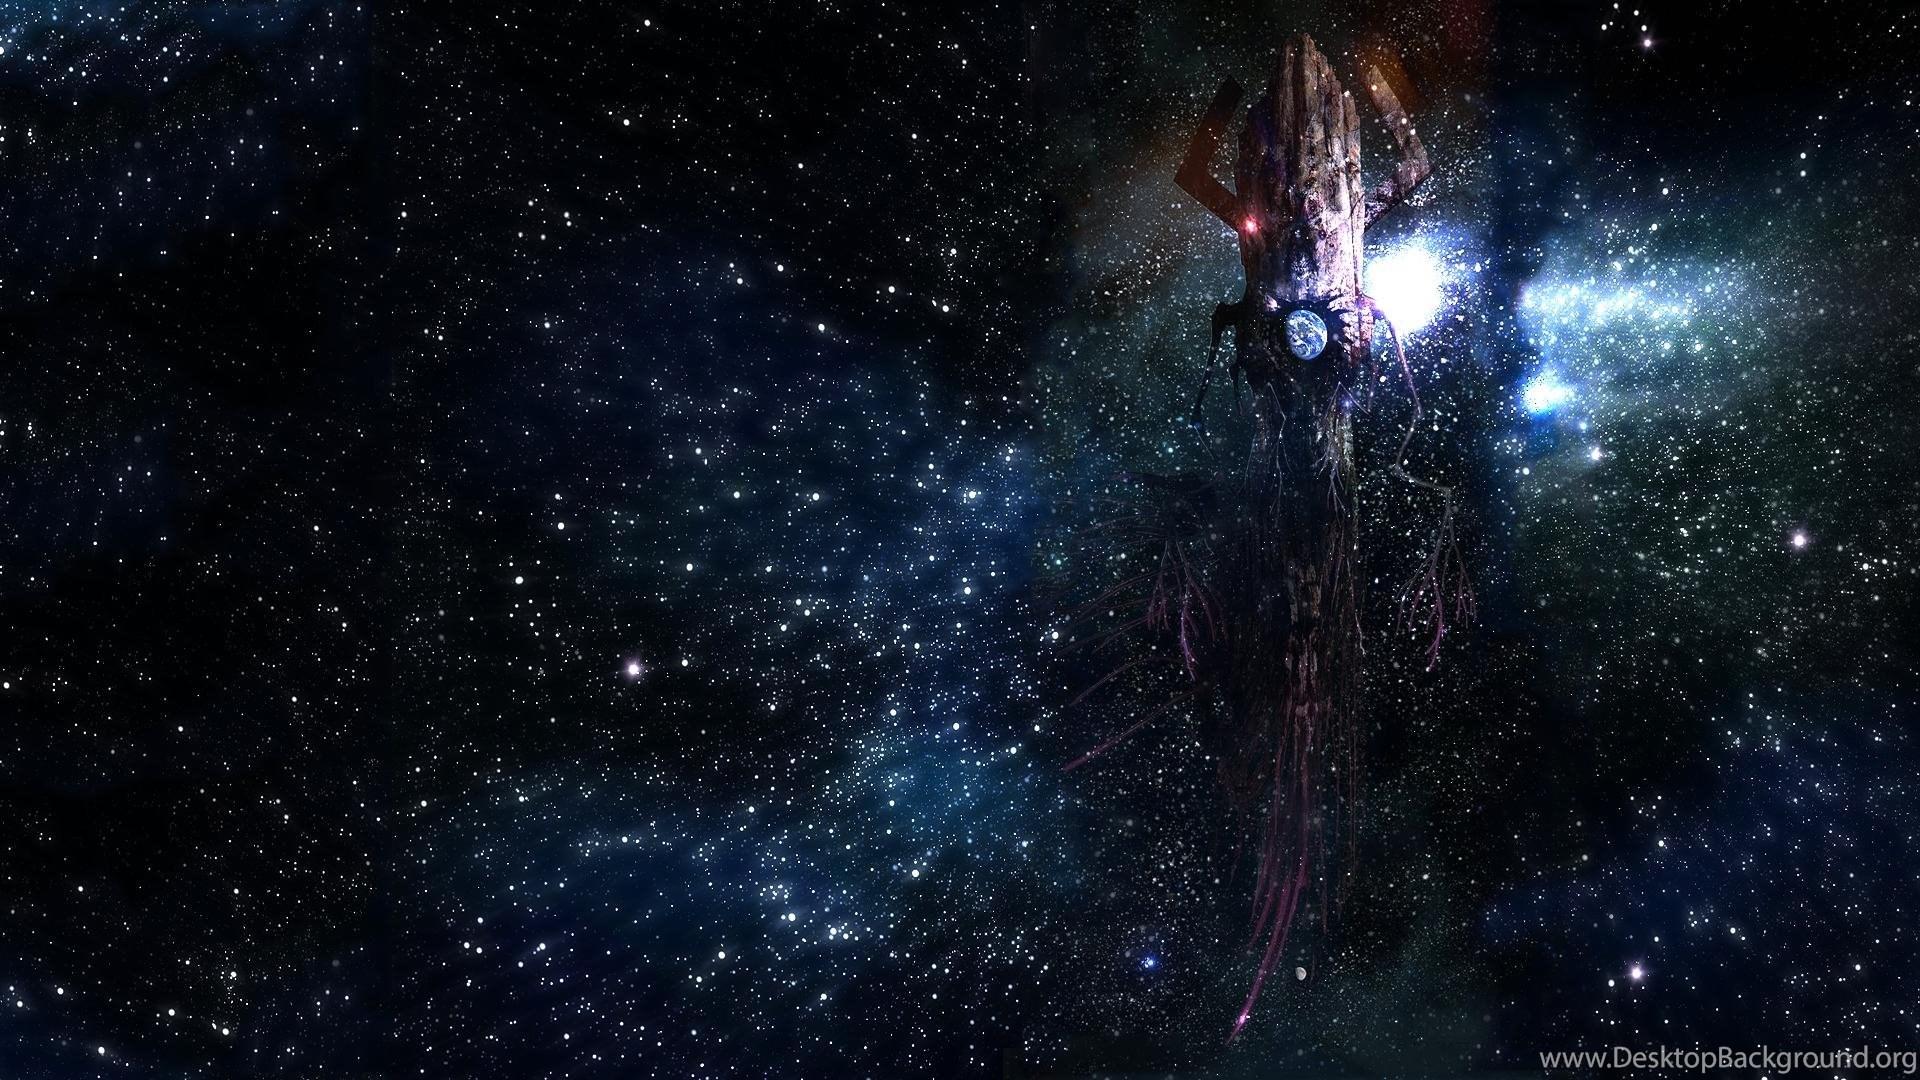 Space Galactus Wallpapers HD 4K